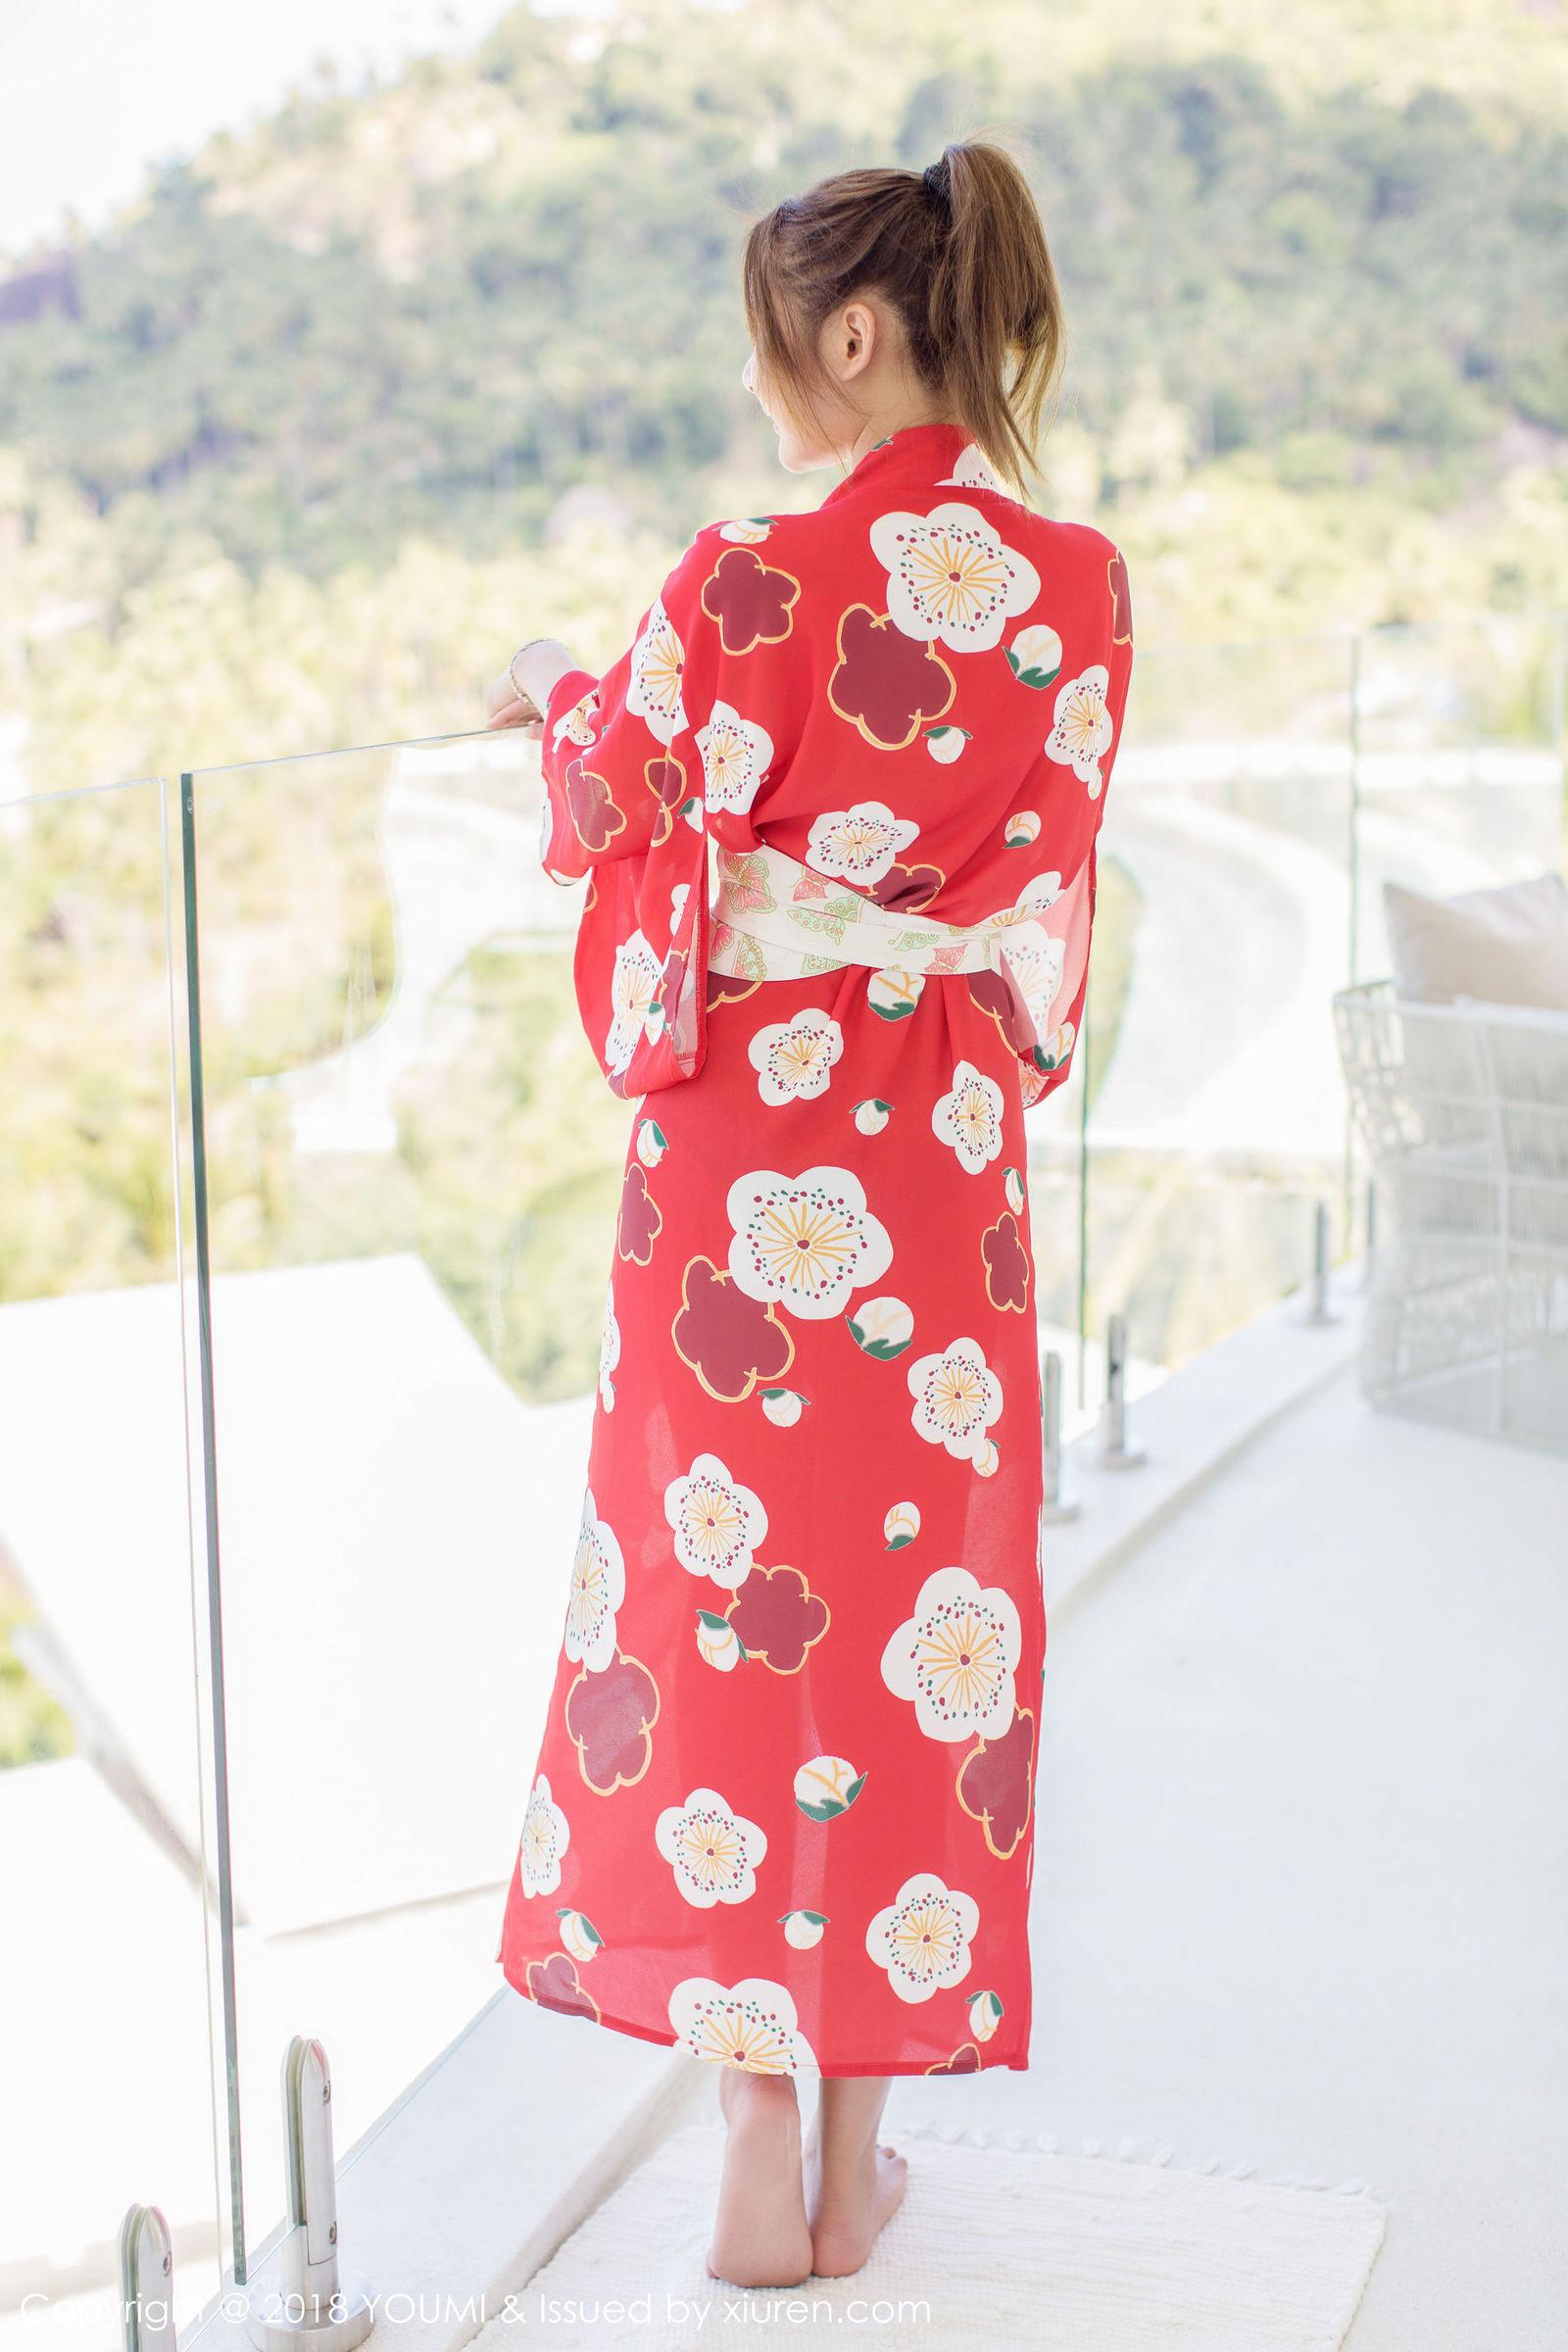 [YouMi尤蜜荟] Vol.167 女神@SOLO-尹菲苏梅岛旅拍丝袜美图[49P]